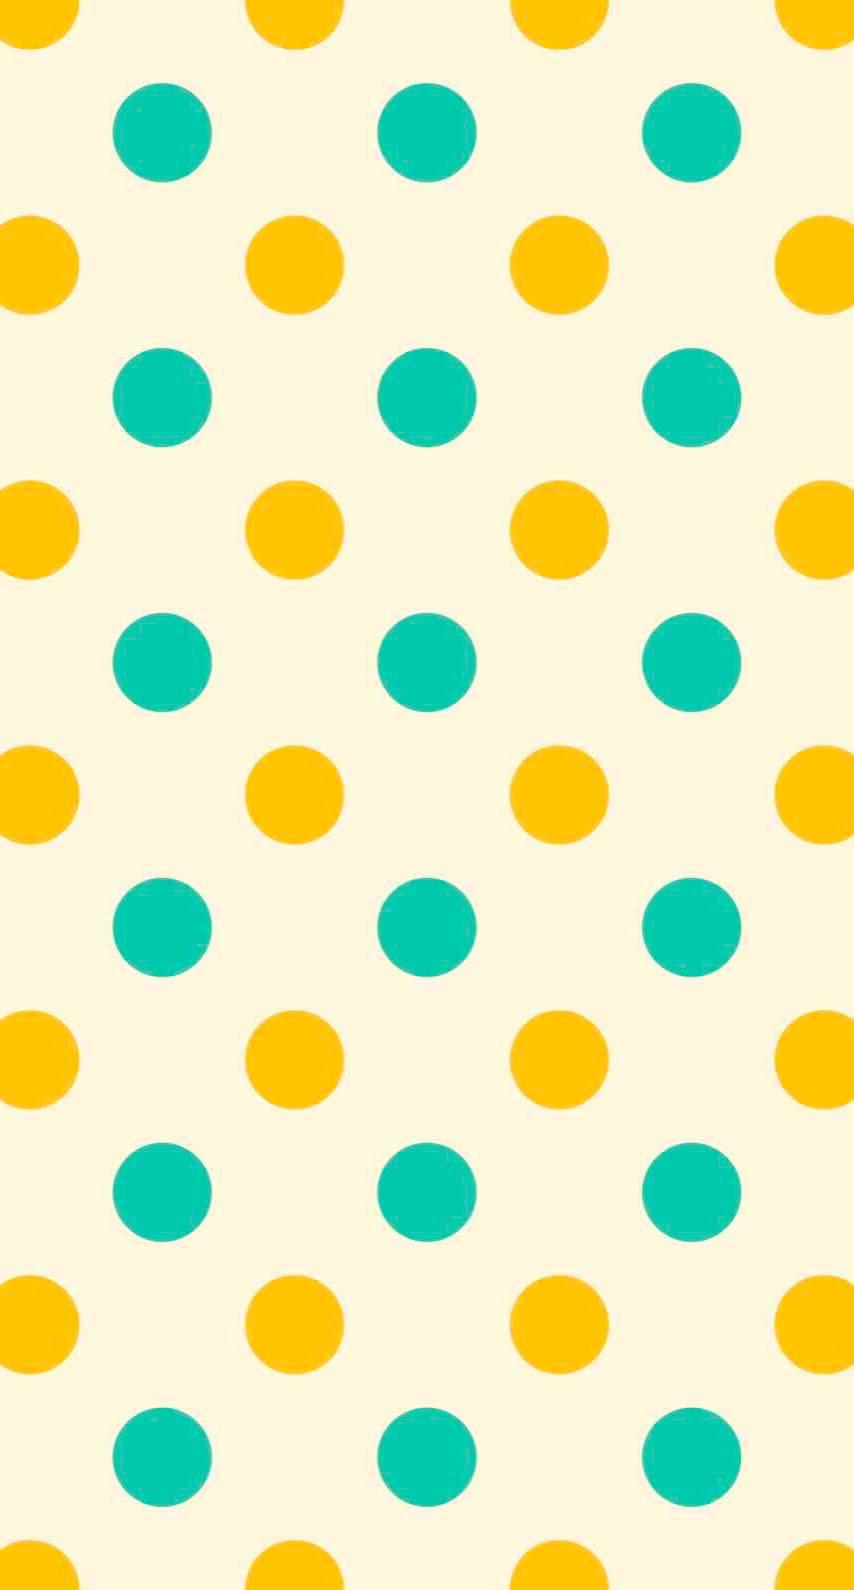 水玉黄色緑 Wallpaper Sc Iphone7壁紙